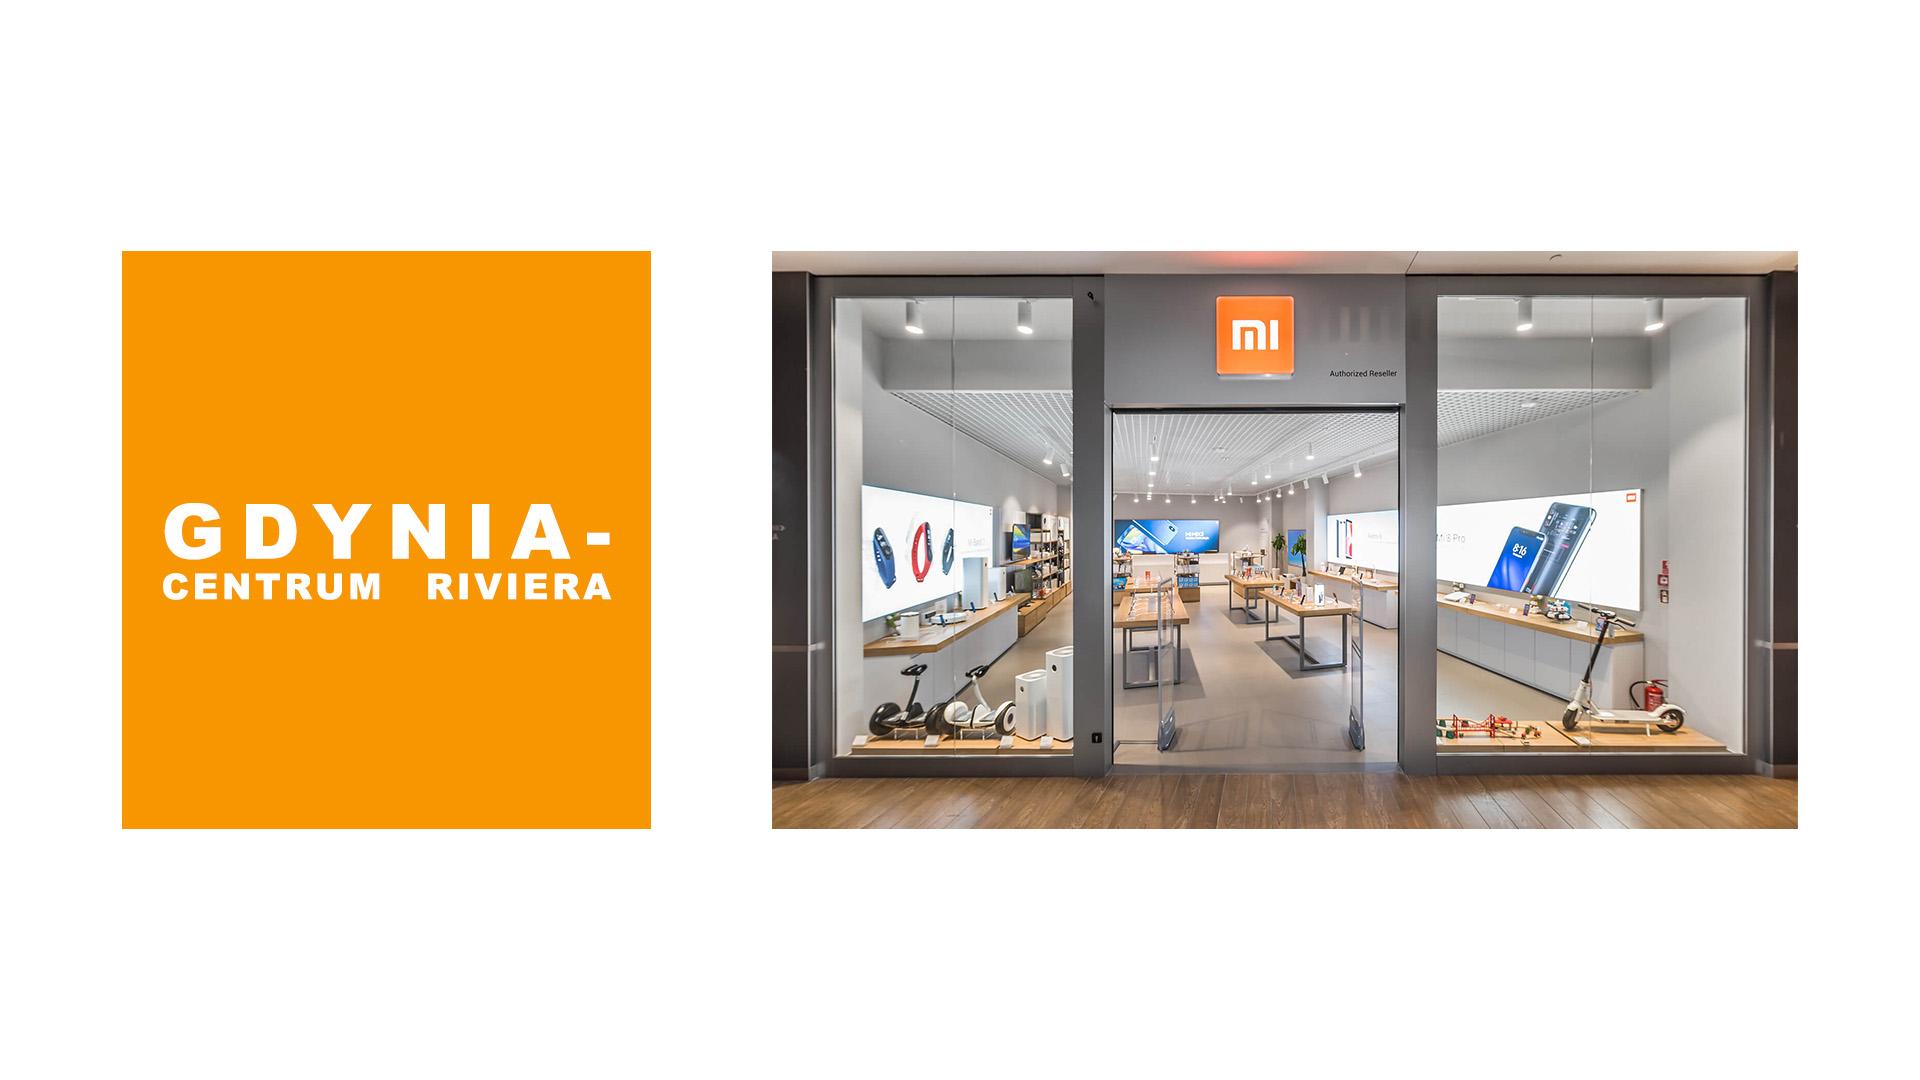 Mi-Store - Gdynia - Centrum Riviera